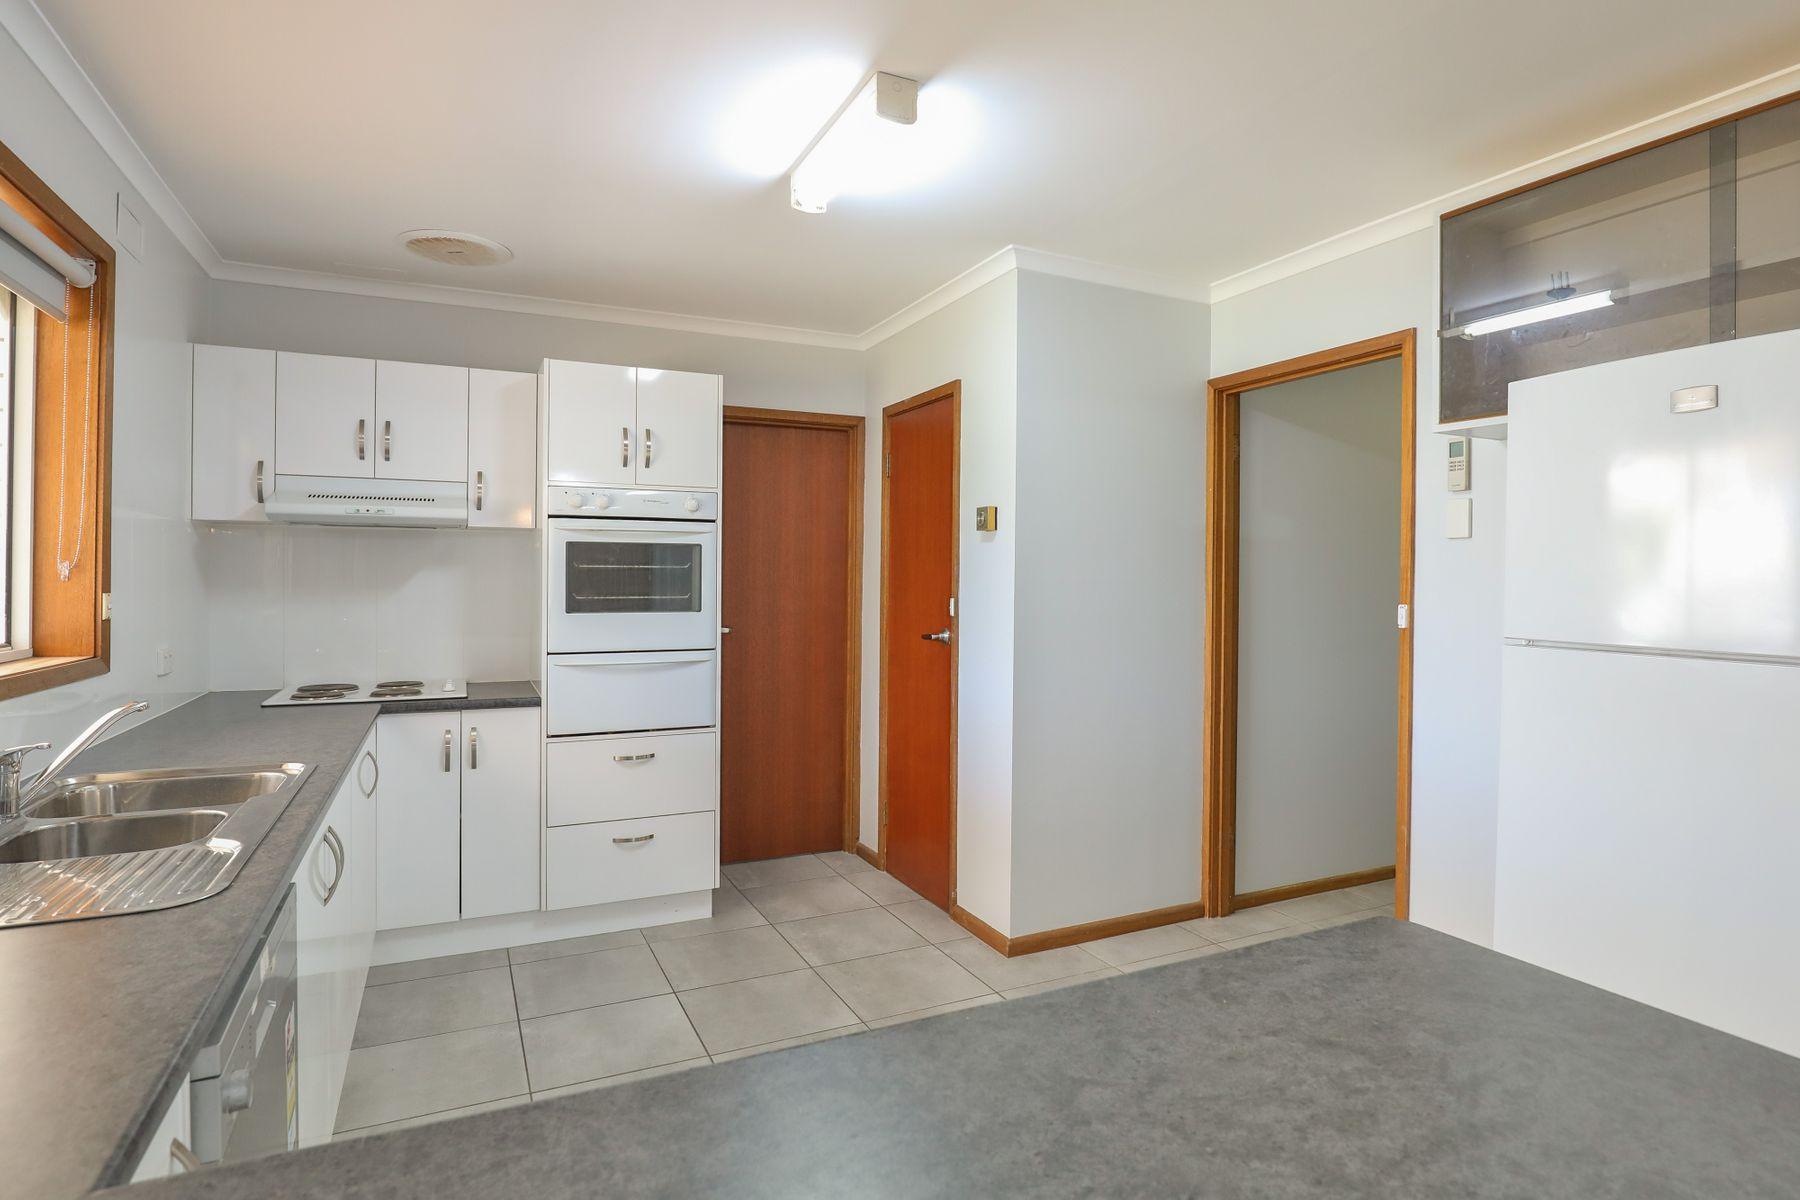 53 Brian Street, Mildura, VIC 3500